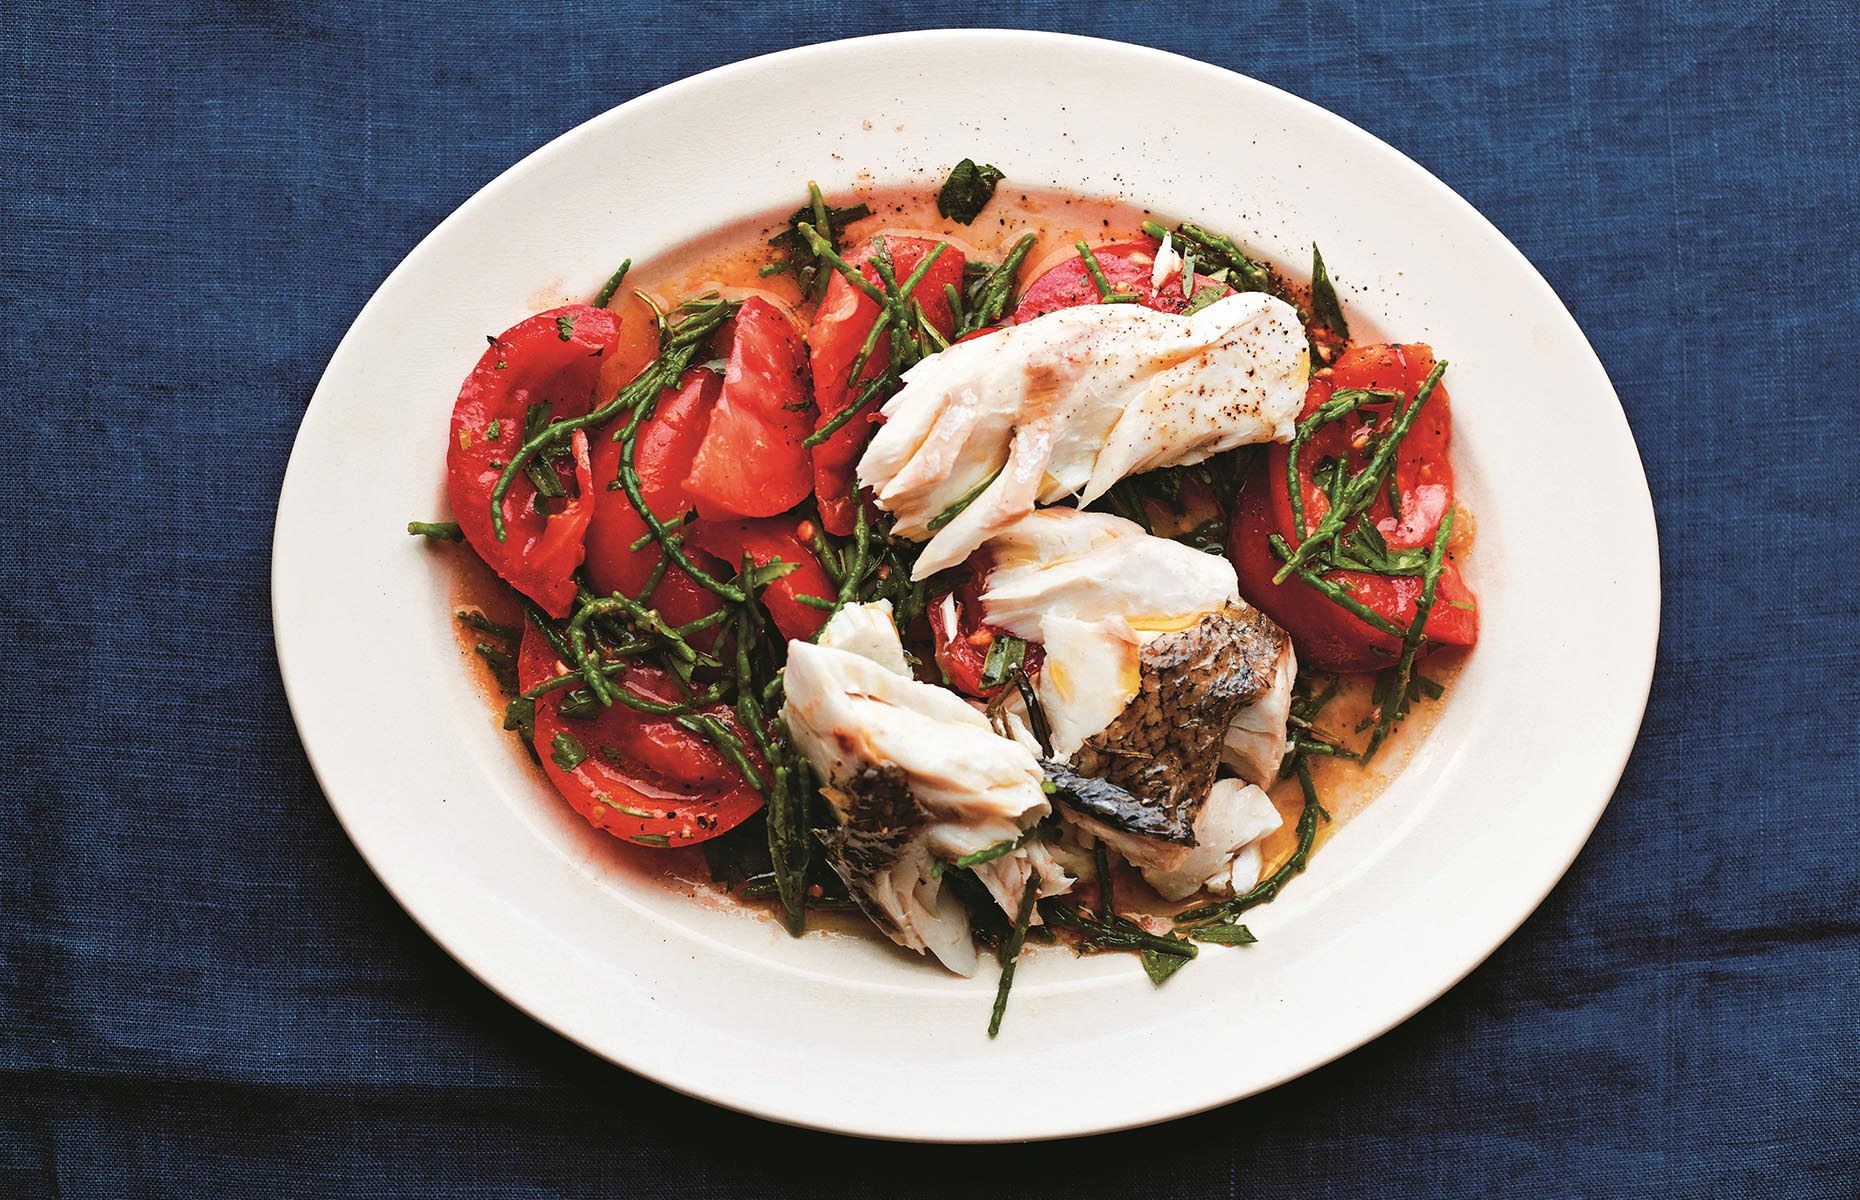 Roast hake, samphire and tomatoes (Image: Sardine/Pavilion Books)